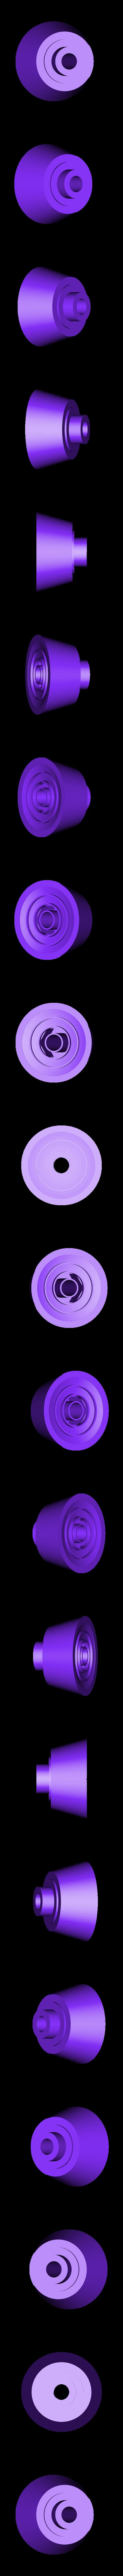 cap_B.stl Download free STL file Spinner. A new system. • 3D print object, bda